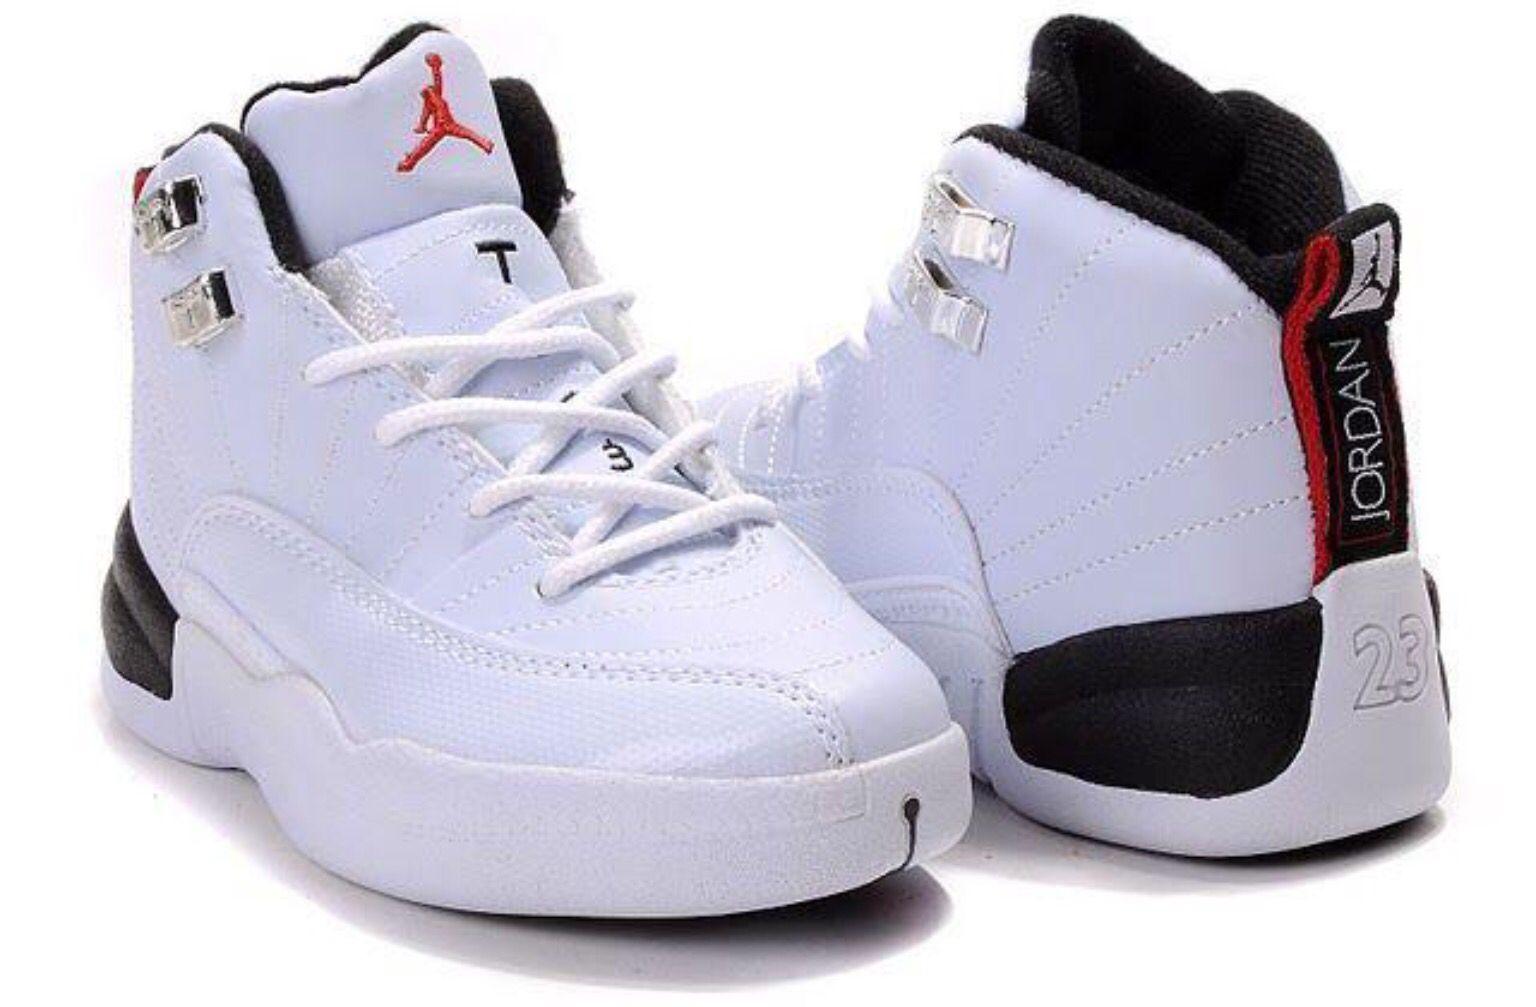 1a7776c9820 Air Jordan Xii · Jordan Basketball Shoes, Jordan Shoes For Kids, Jordan  Shoes Online, Nike Shoes Online